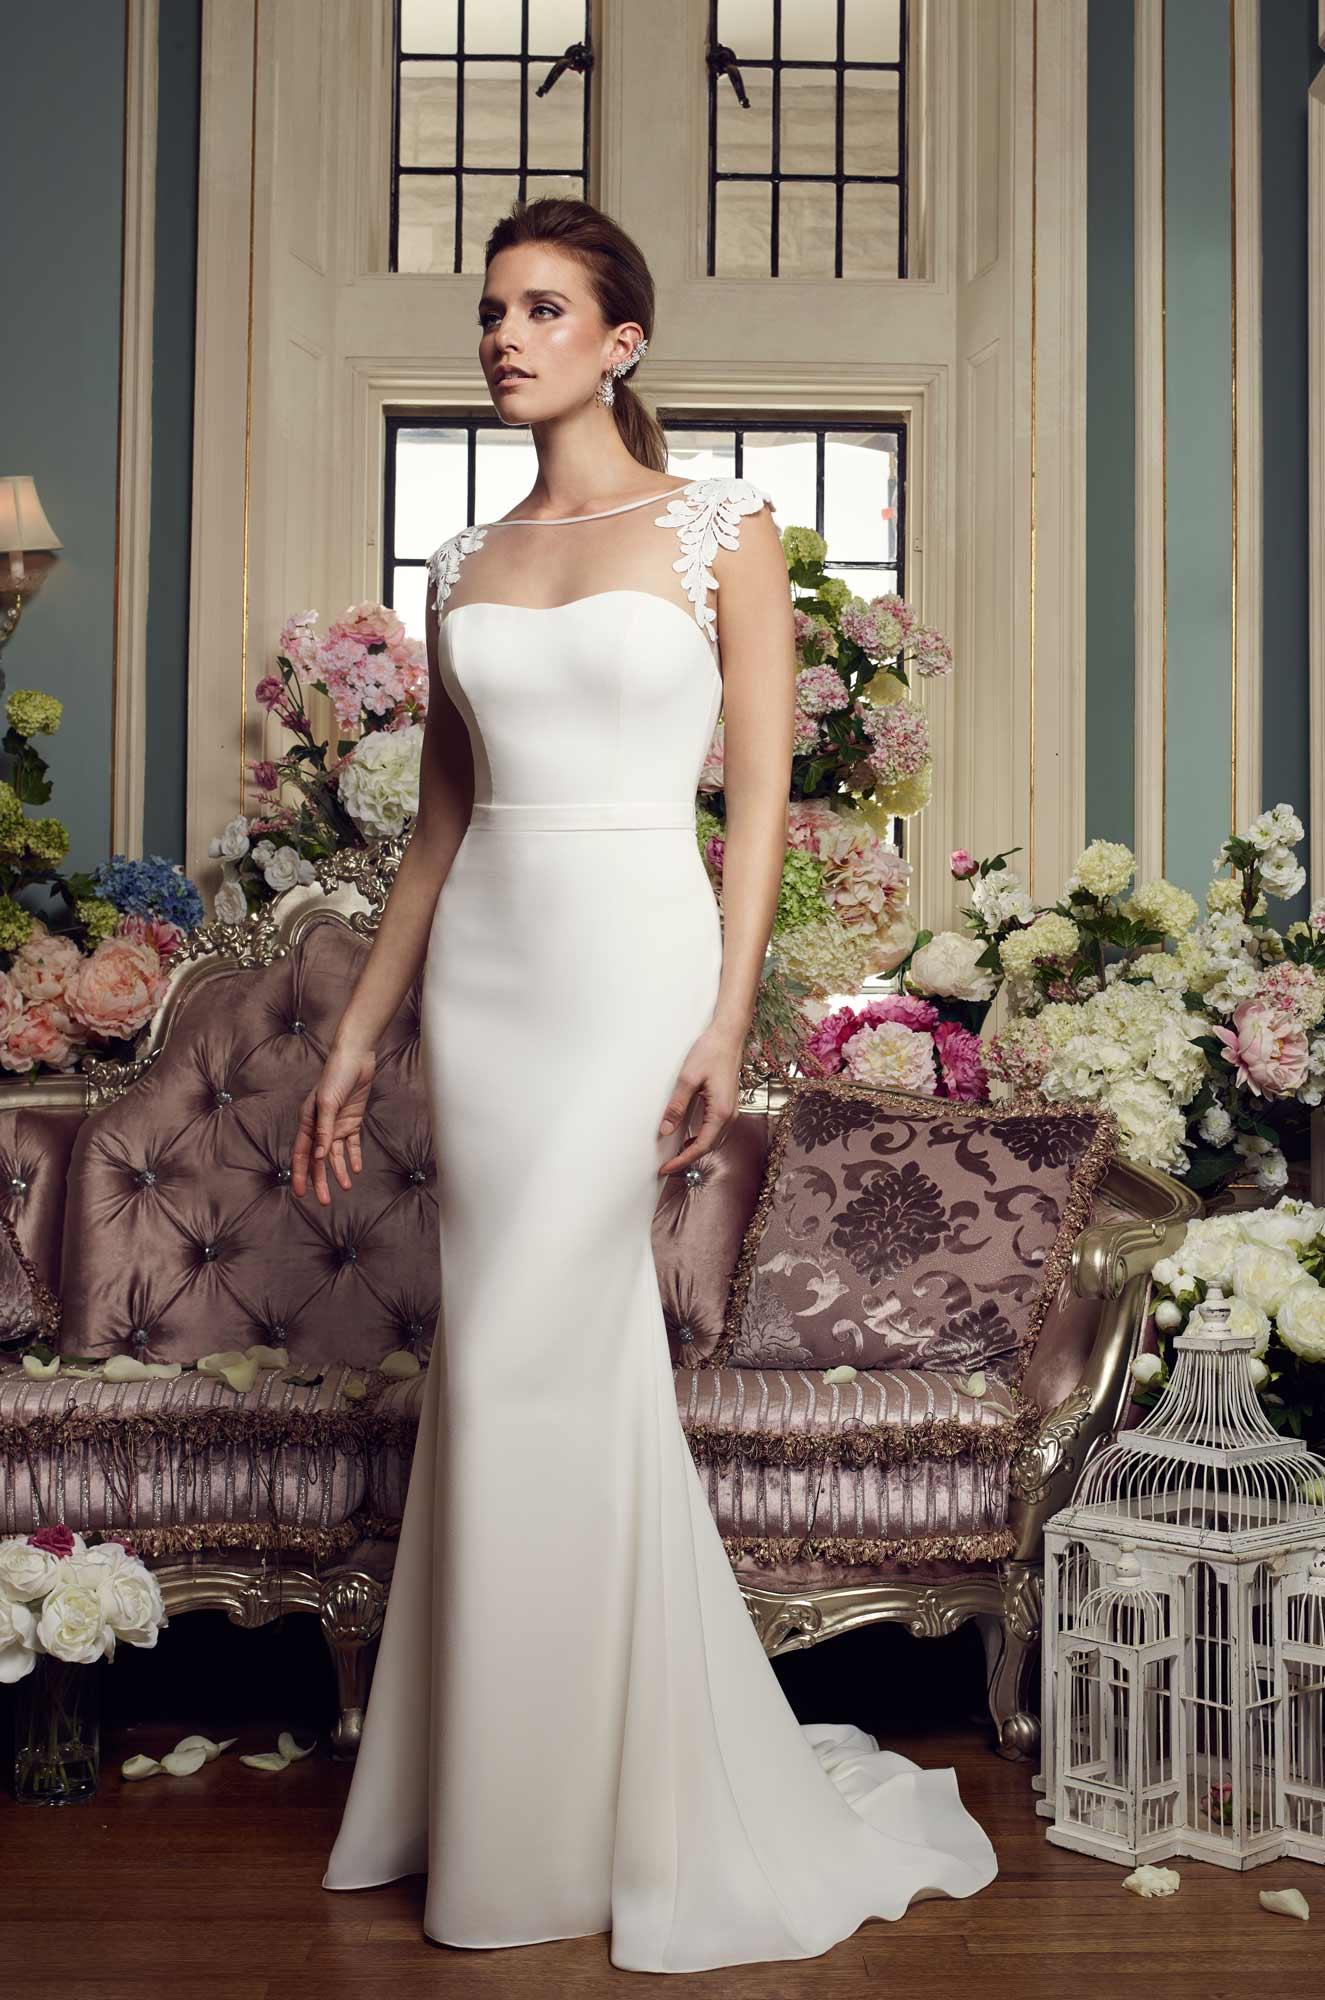 Detachable Train Wedding Dress - Style #2160 | Mikaella Bridal